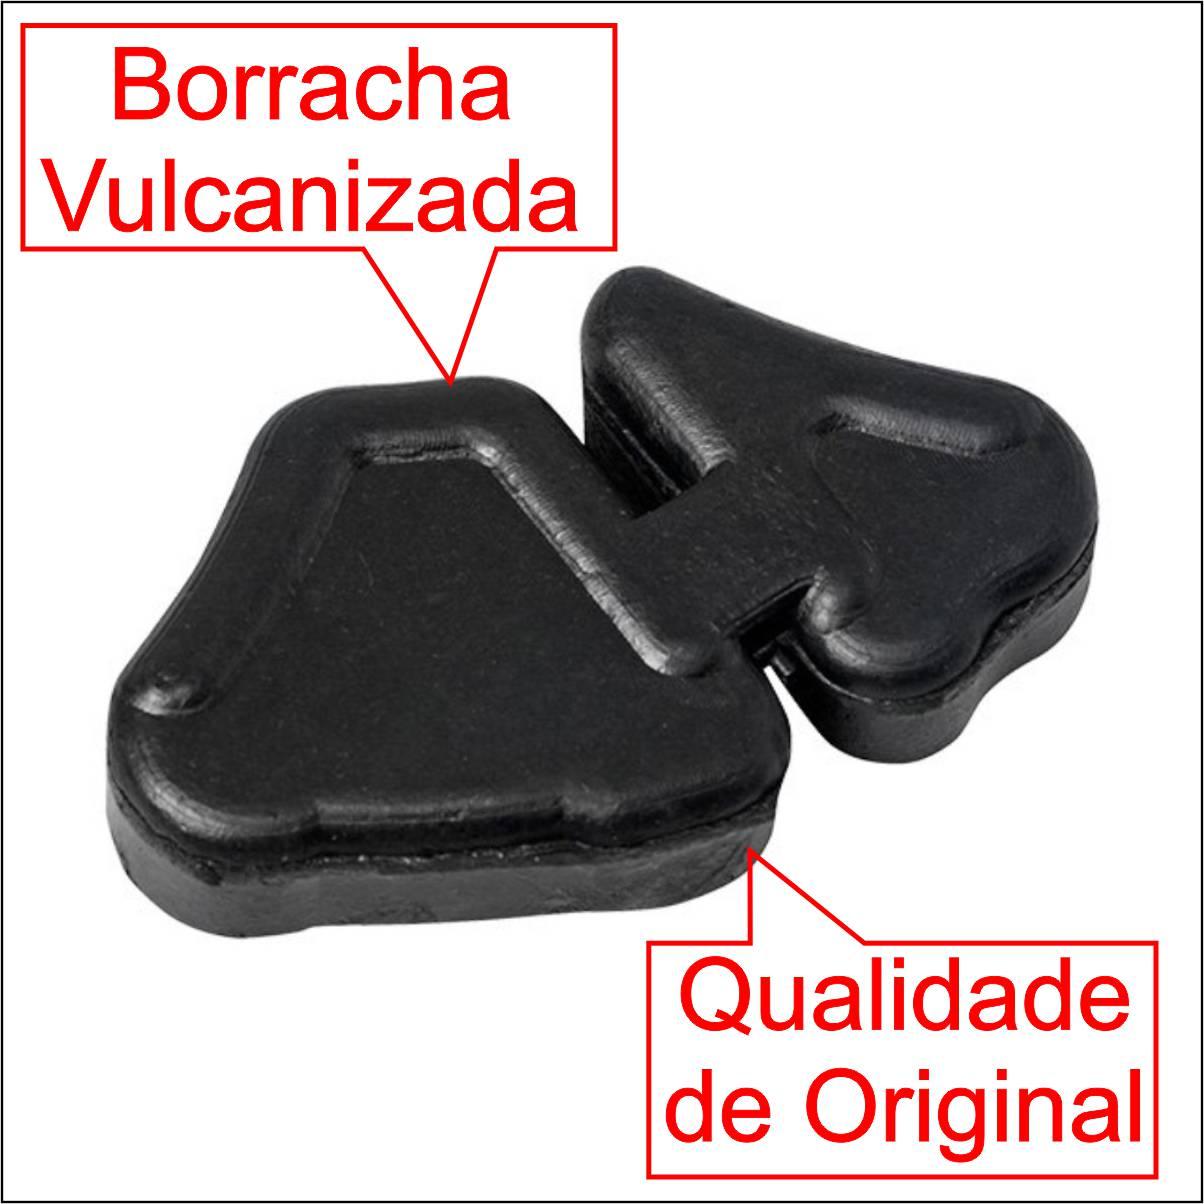 KIT COXIM BORRACHA BUCHA DA COROA RODA TRASEIRA BIZ 125 e BIZ 110i JOGO 4 PEÇAS + GRAXA SPRAY 60ml